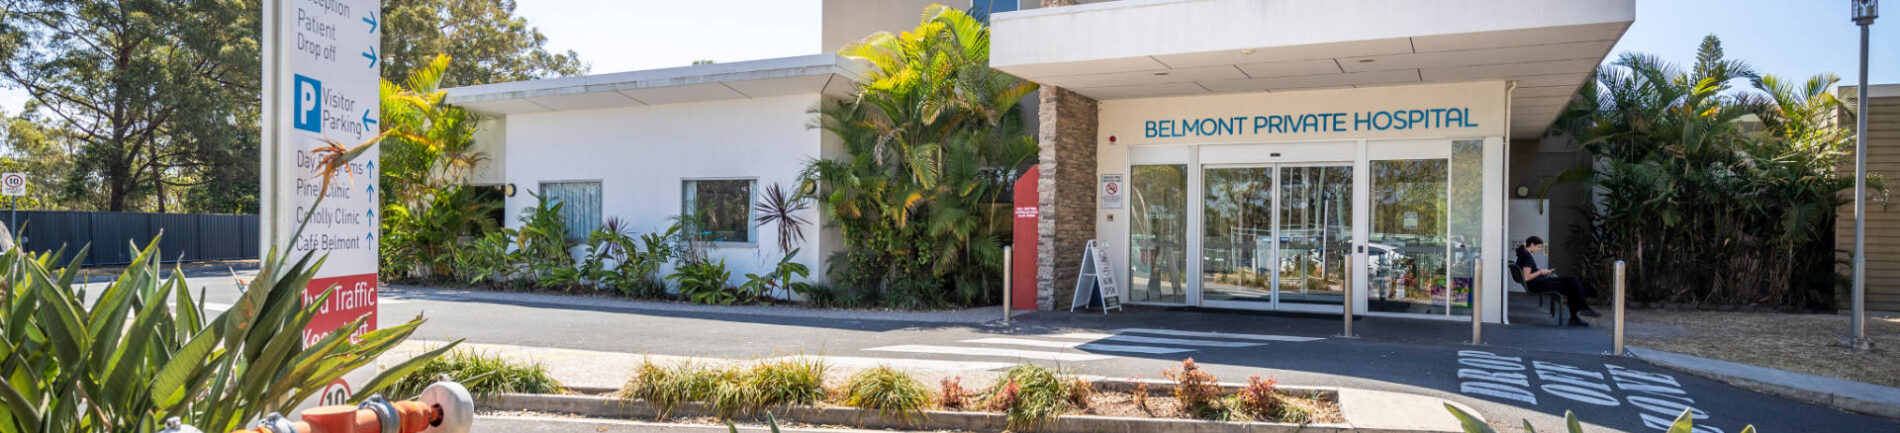 Belmont Private Hospital